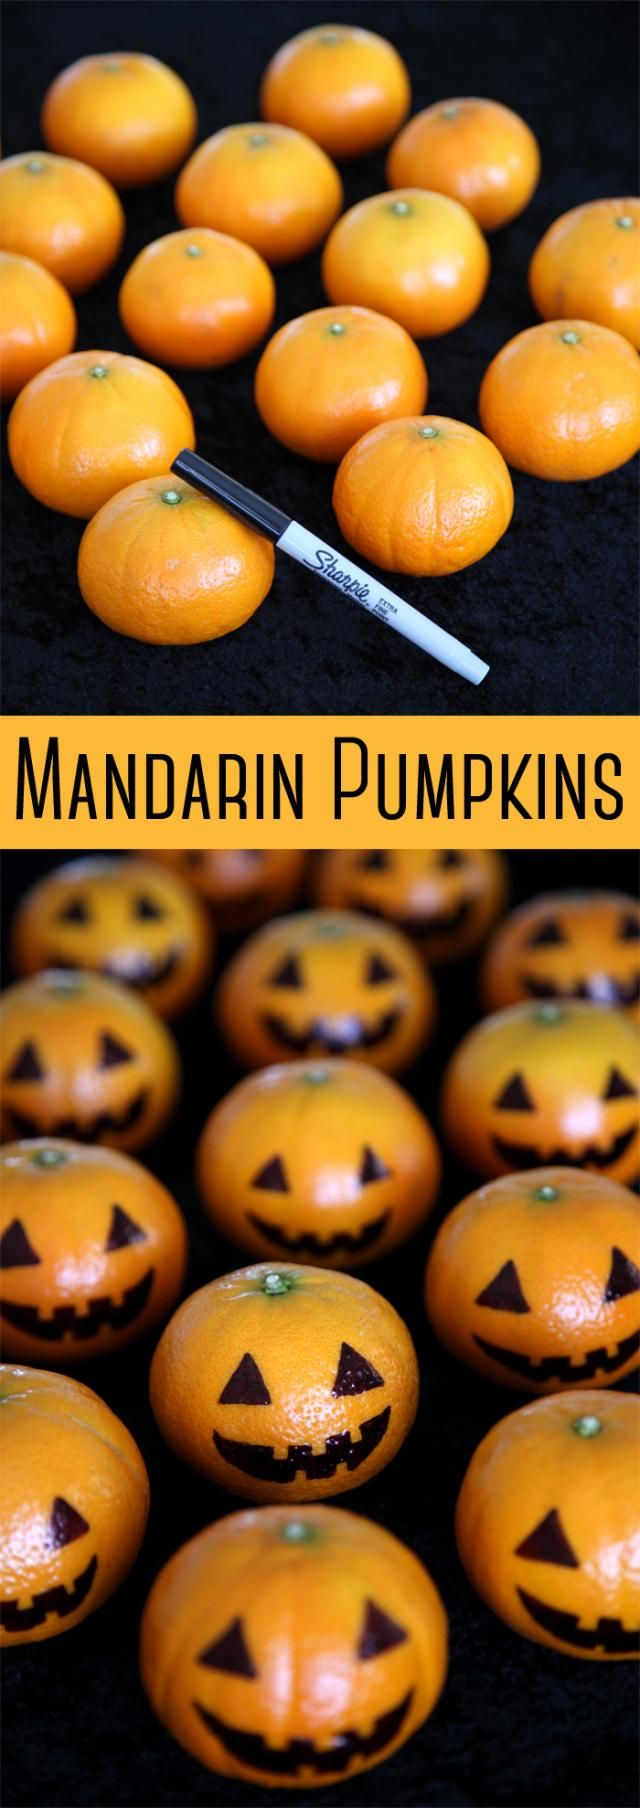 Food Design: 5 Easy Halloween Food Ideas